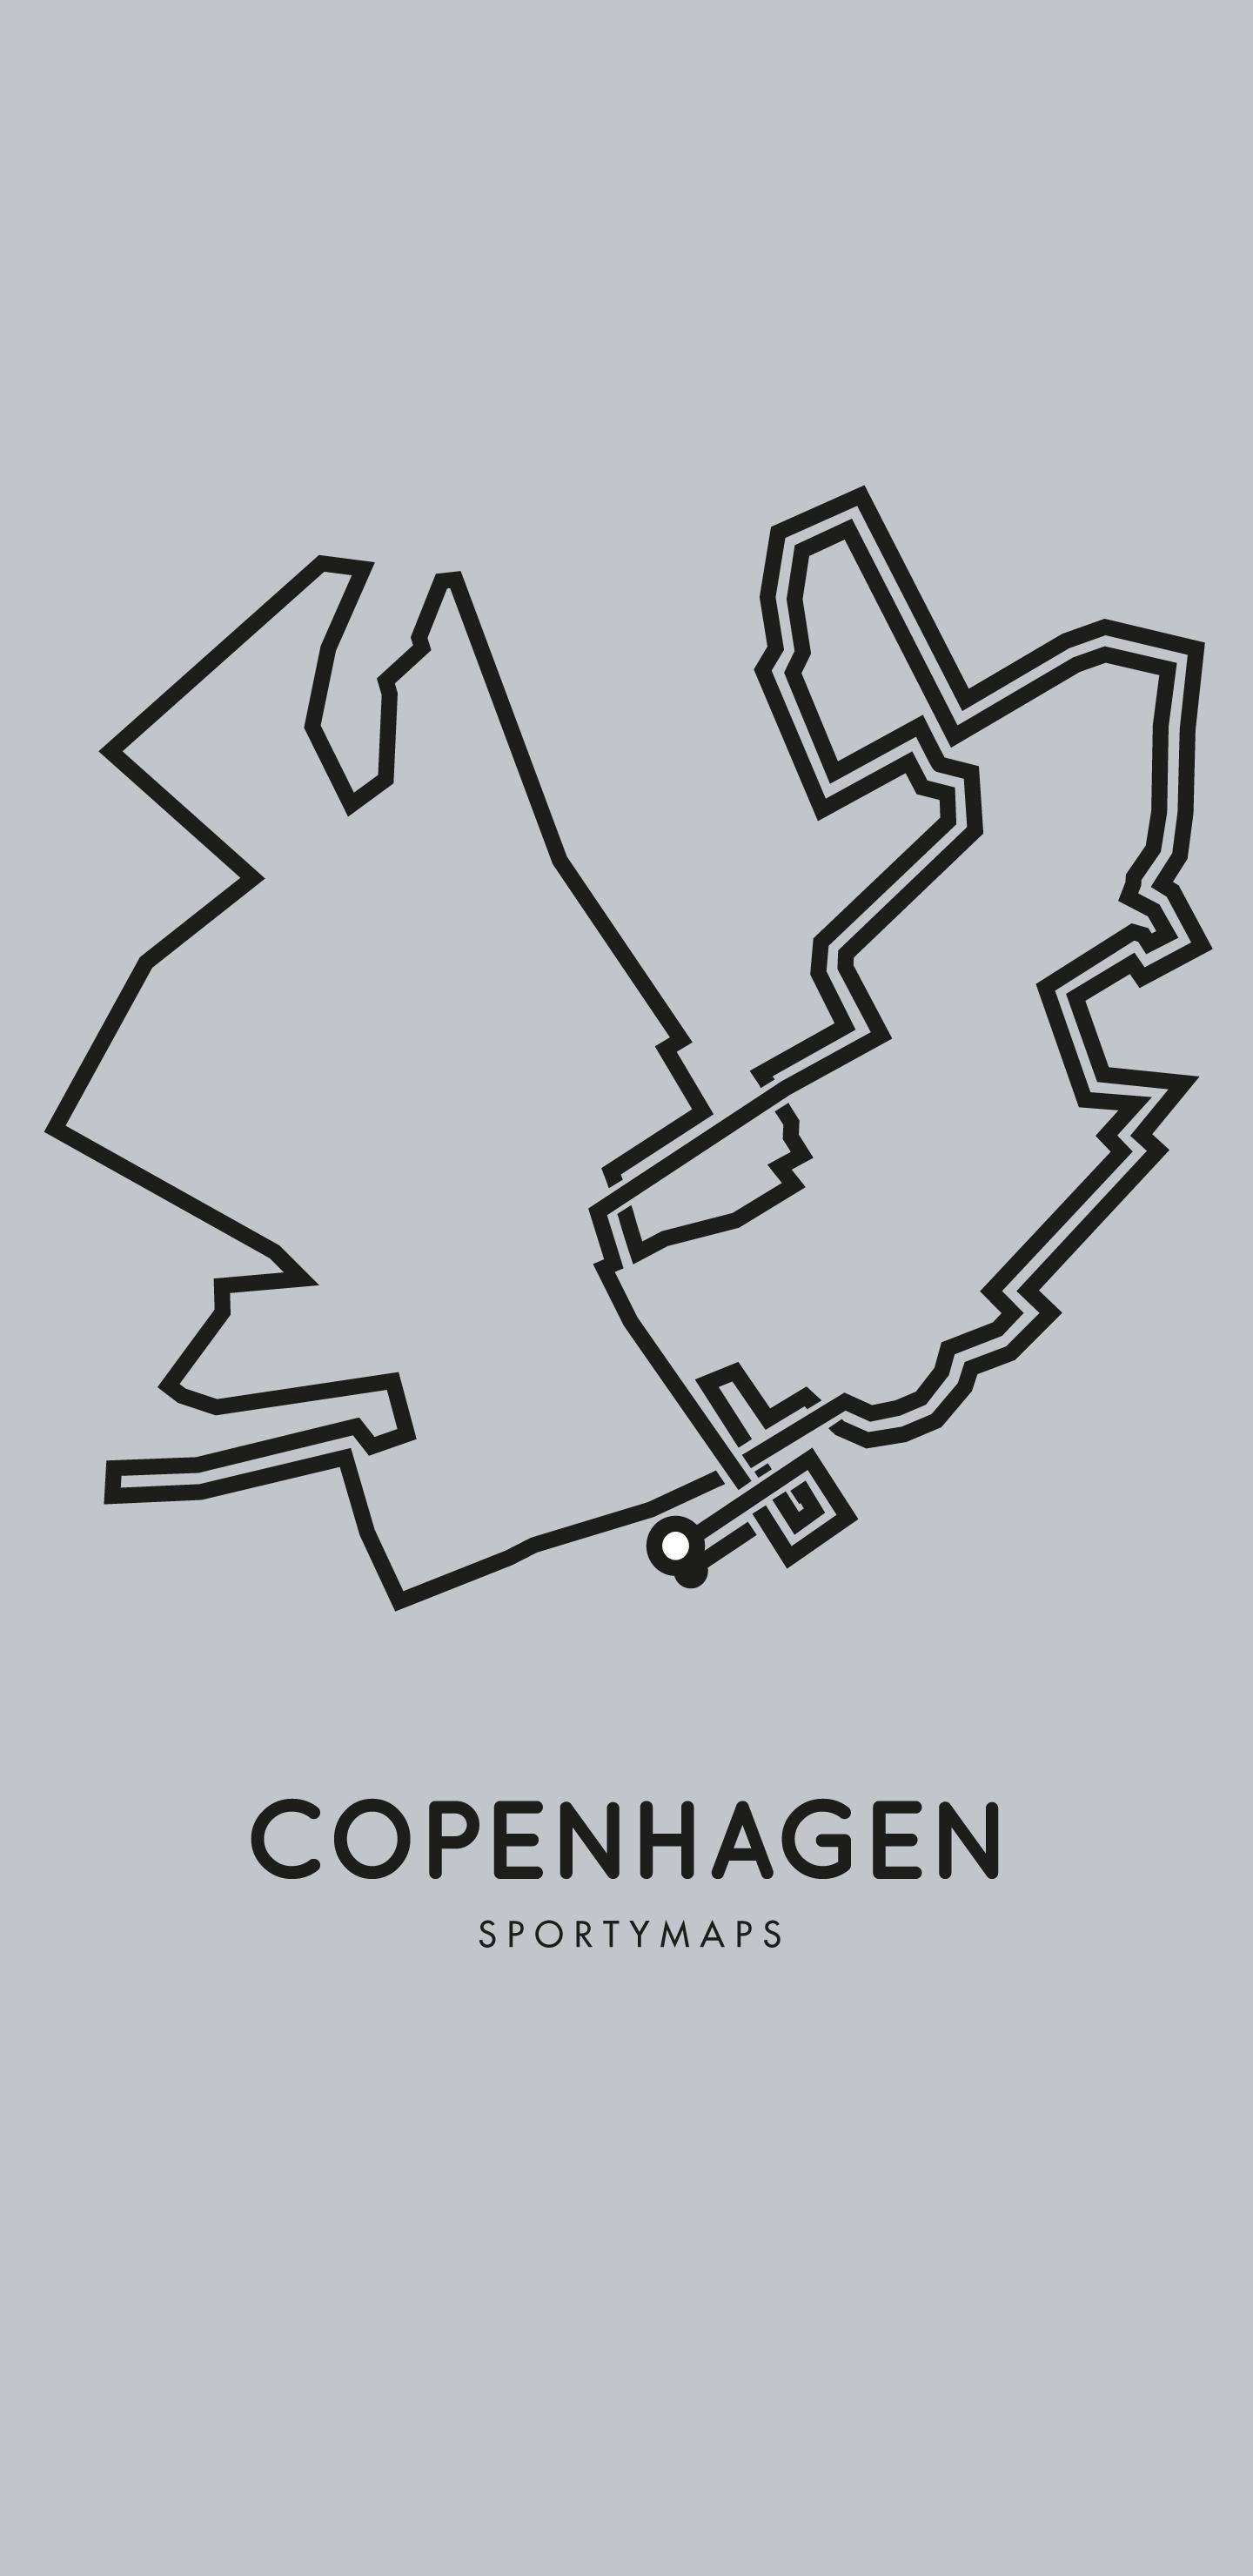 Sportymaps-Copenhagen-marathon-gray